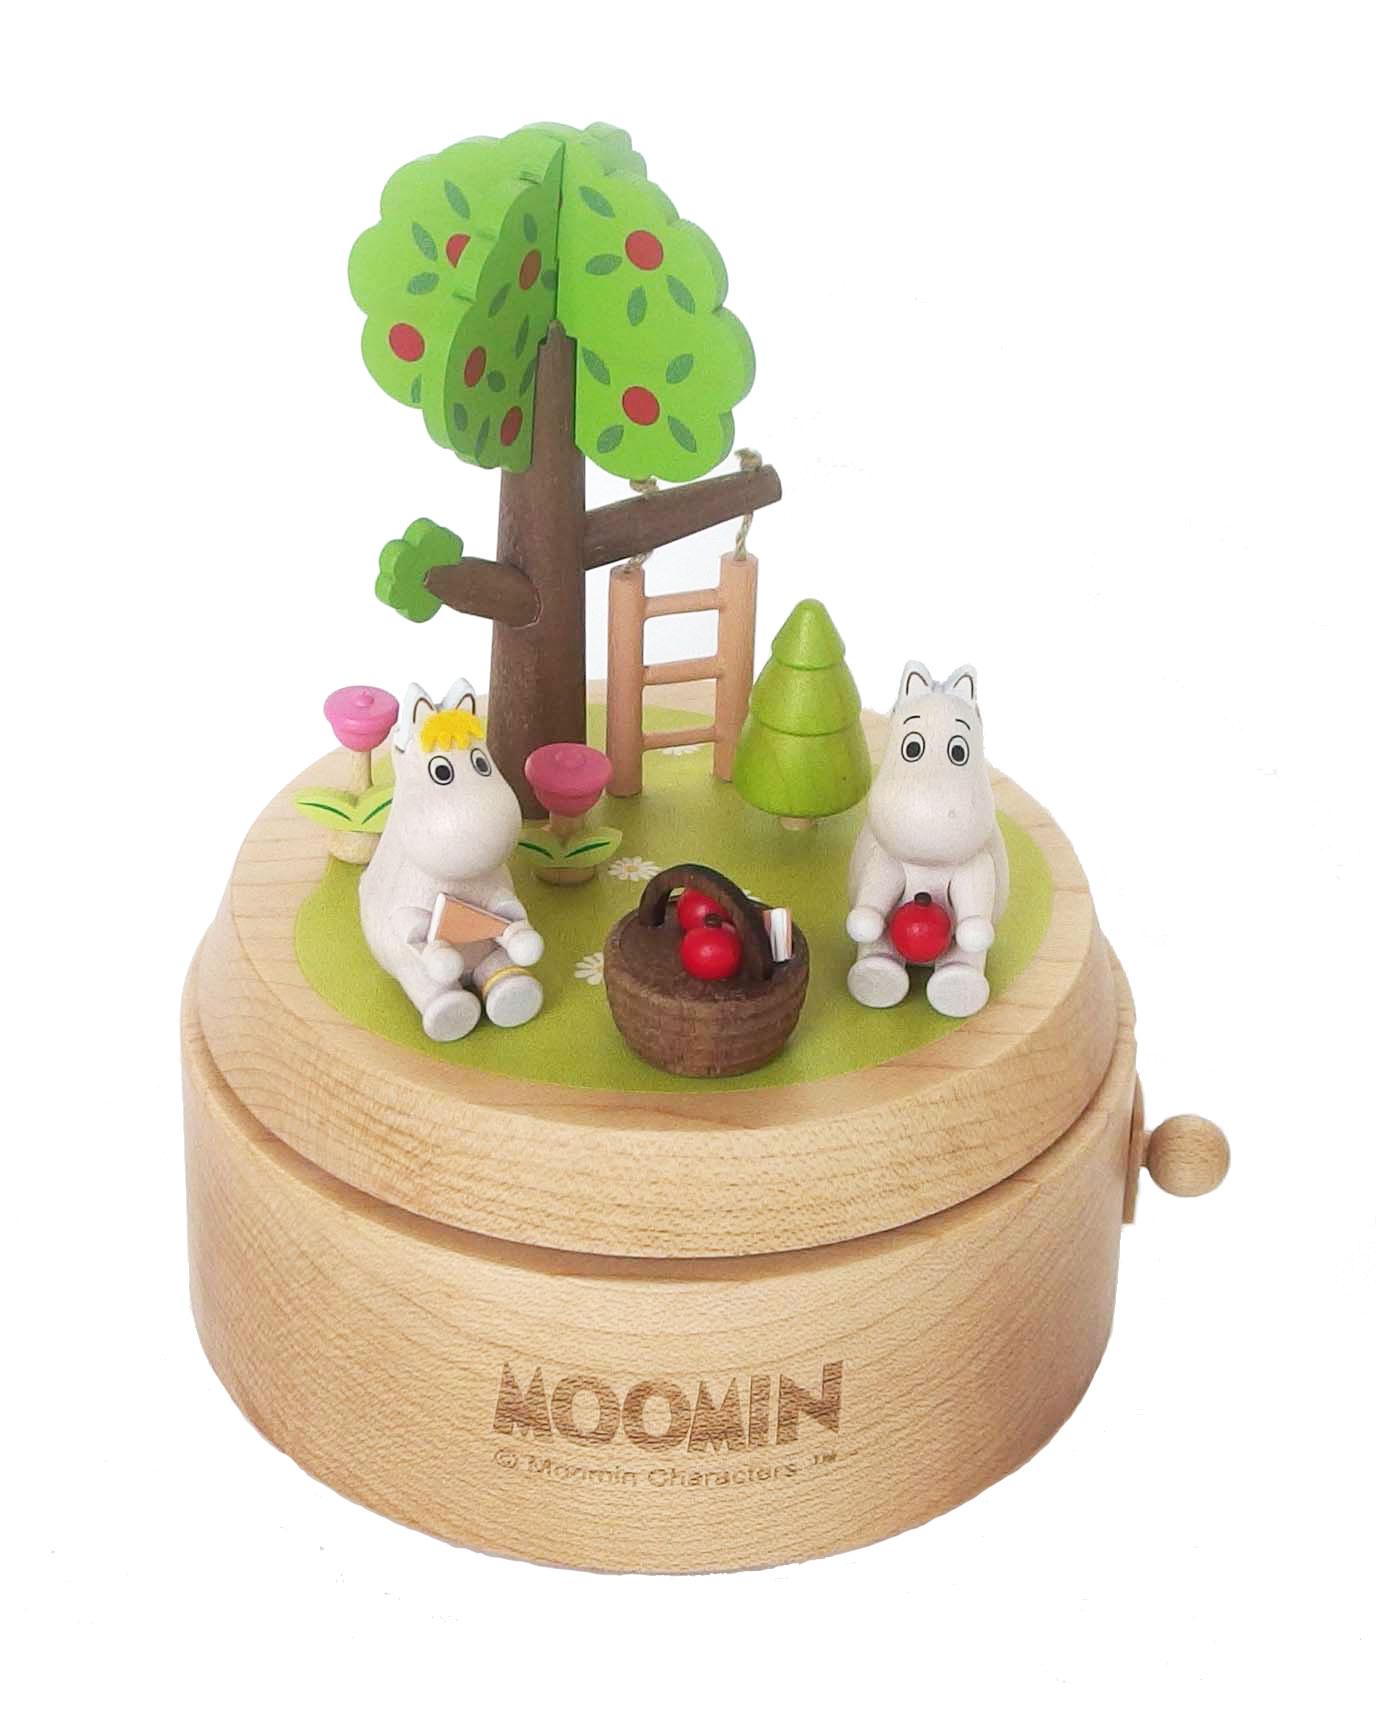 Artic-Hall Music box-Moomin picnic